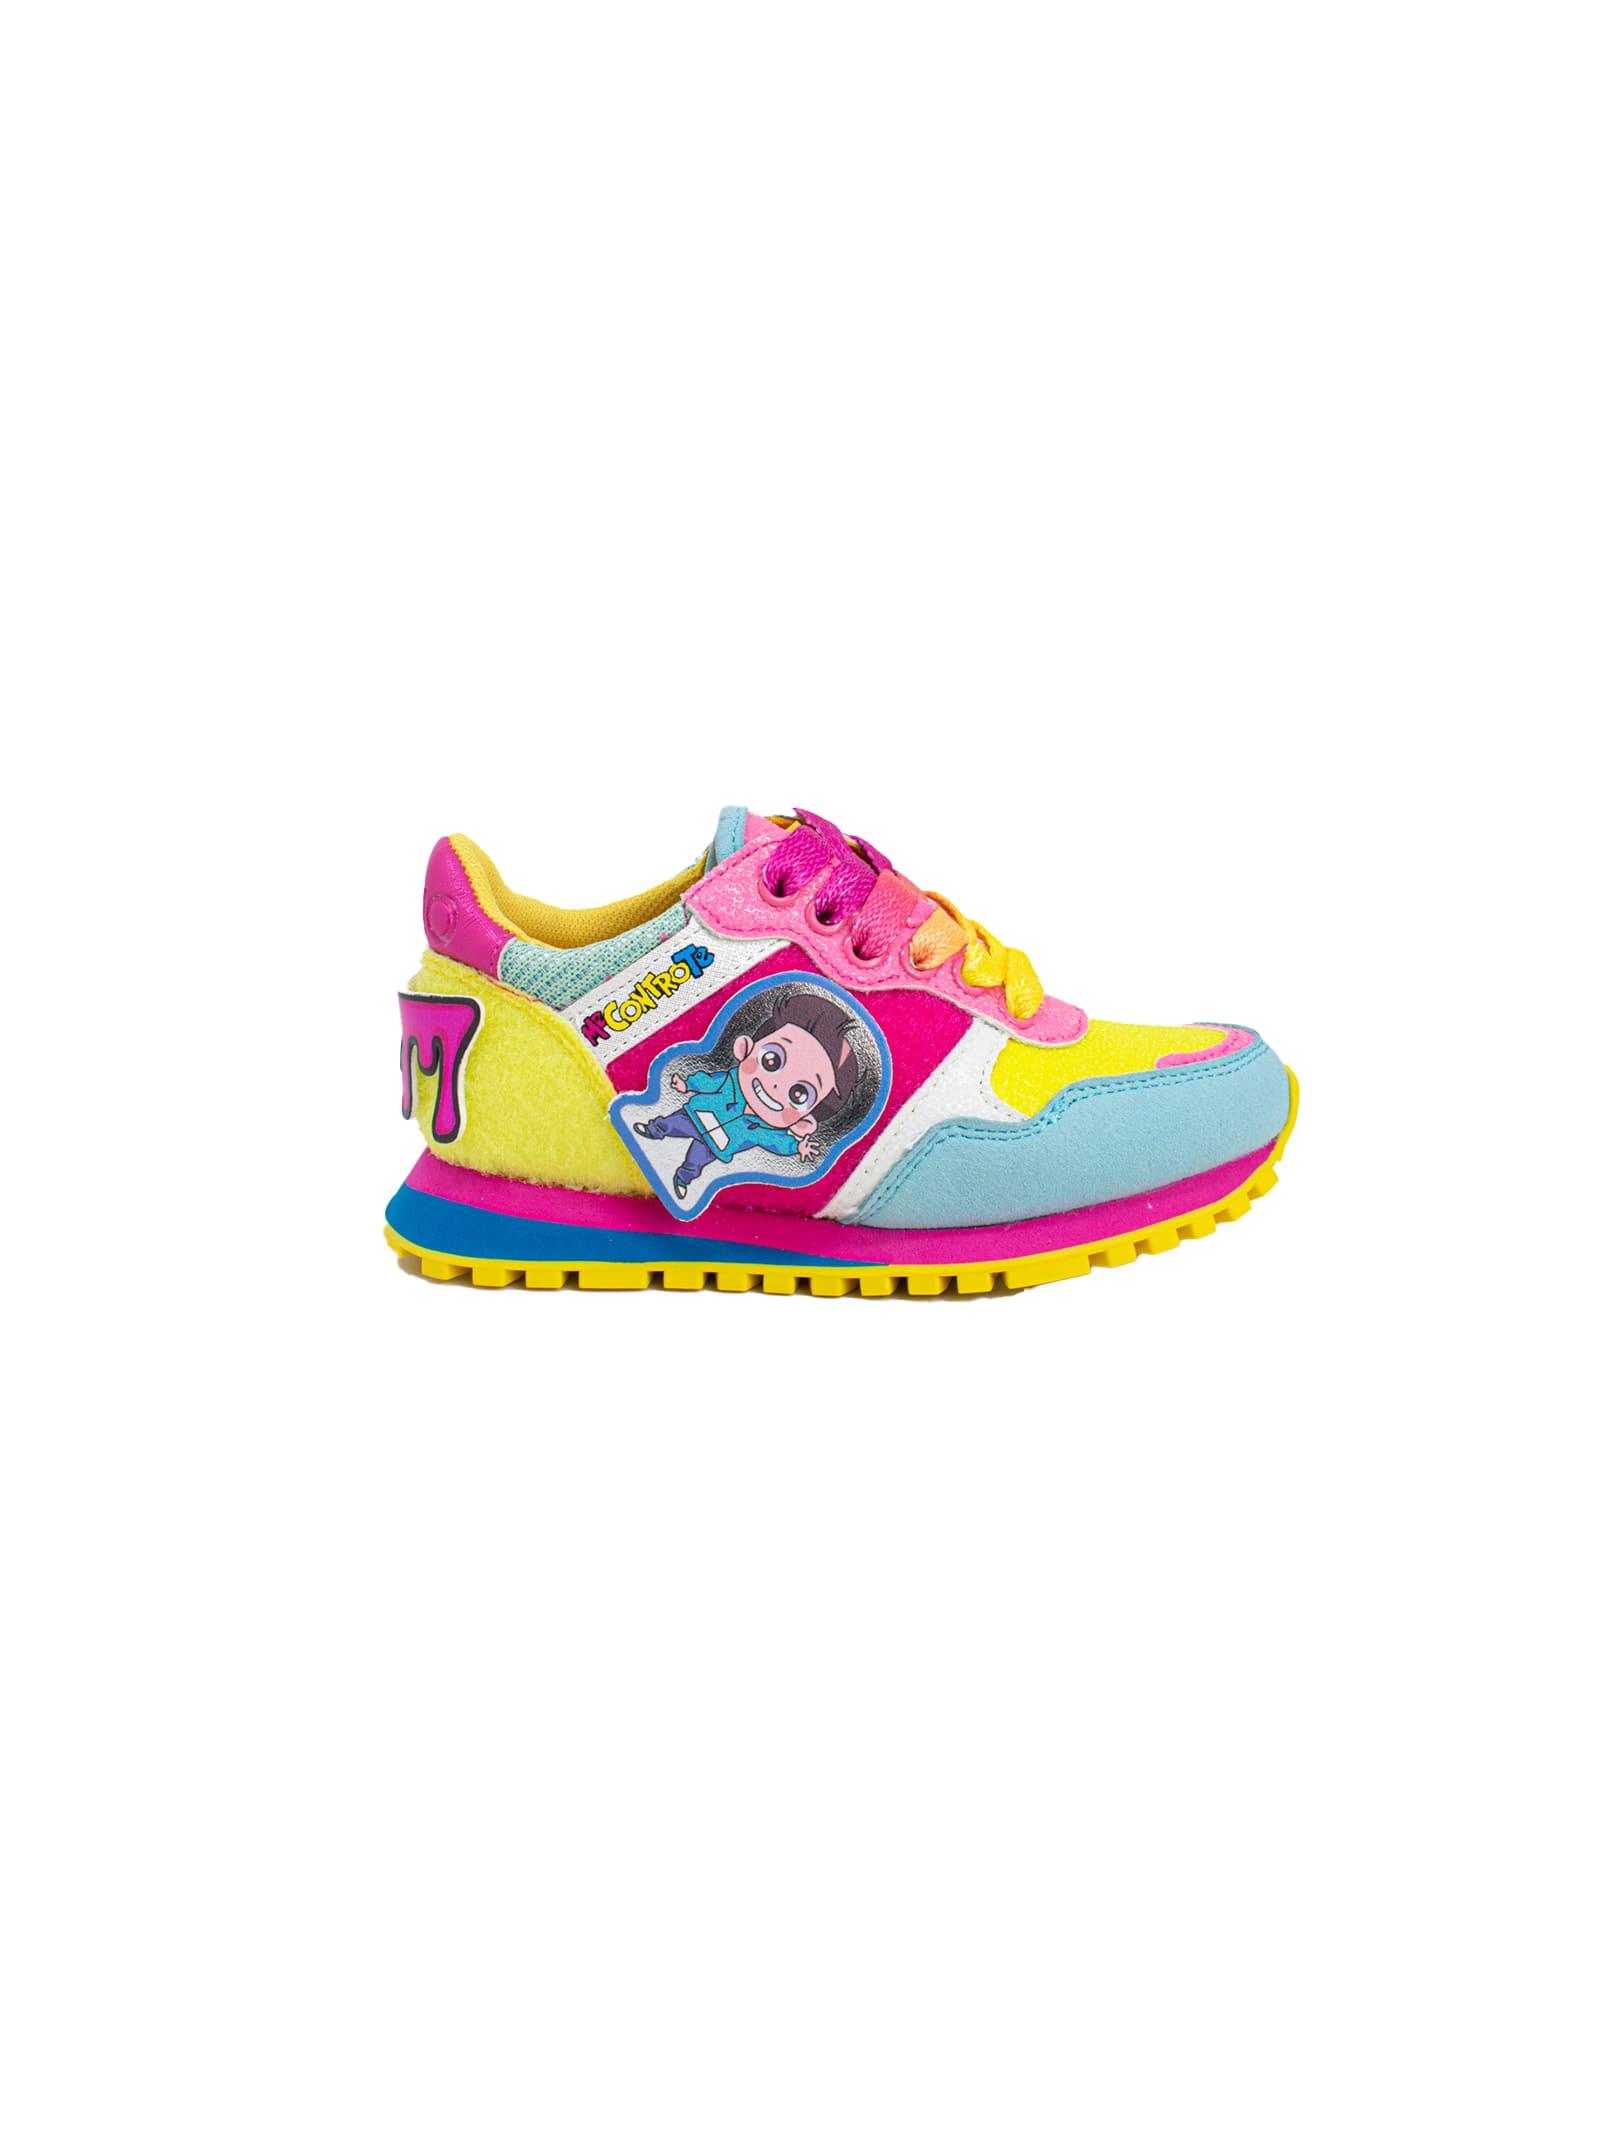 Sneaker e Bag Bambina Wonder 2 MECONTROTE LIU-JO MECONTROTE | Sneakers | 4B1003TX212S1136MULTICOLOR